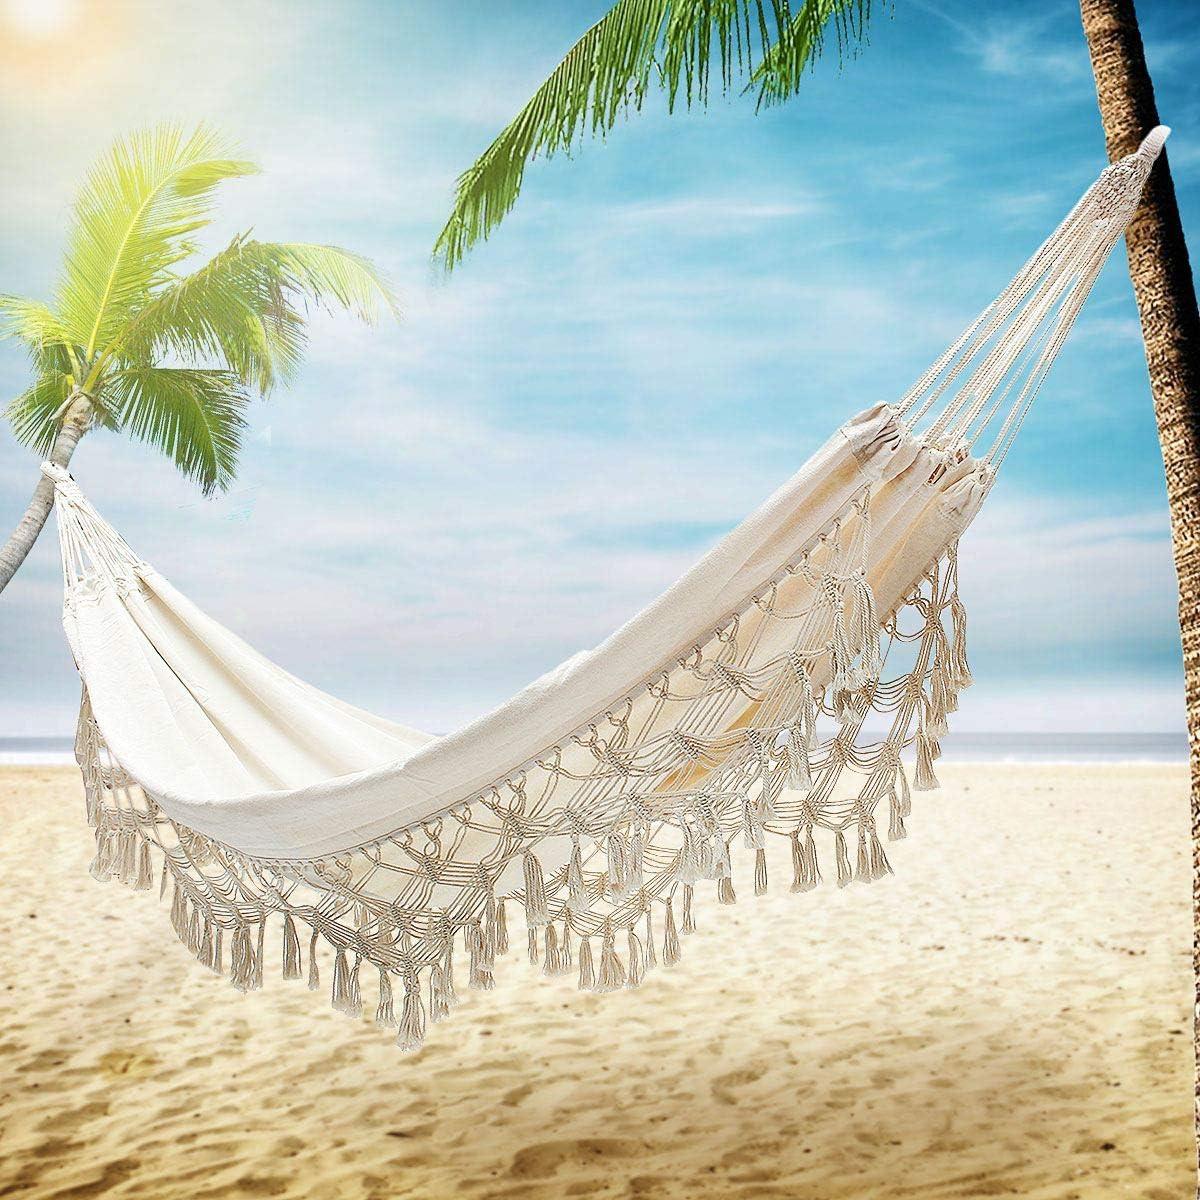 TMcom Hammock, Handmade Organic Cotton Classic Hammock Macrame Fringe Tree Hammocks Swing Bed for Camping,Beach,Bedroom, Patio,Patio, Porch, Outdoor,Indoor,Wedding Decor,Yard